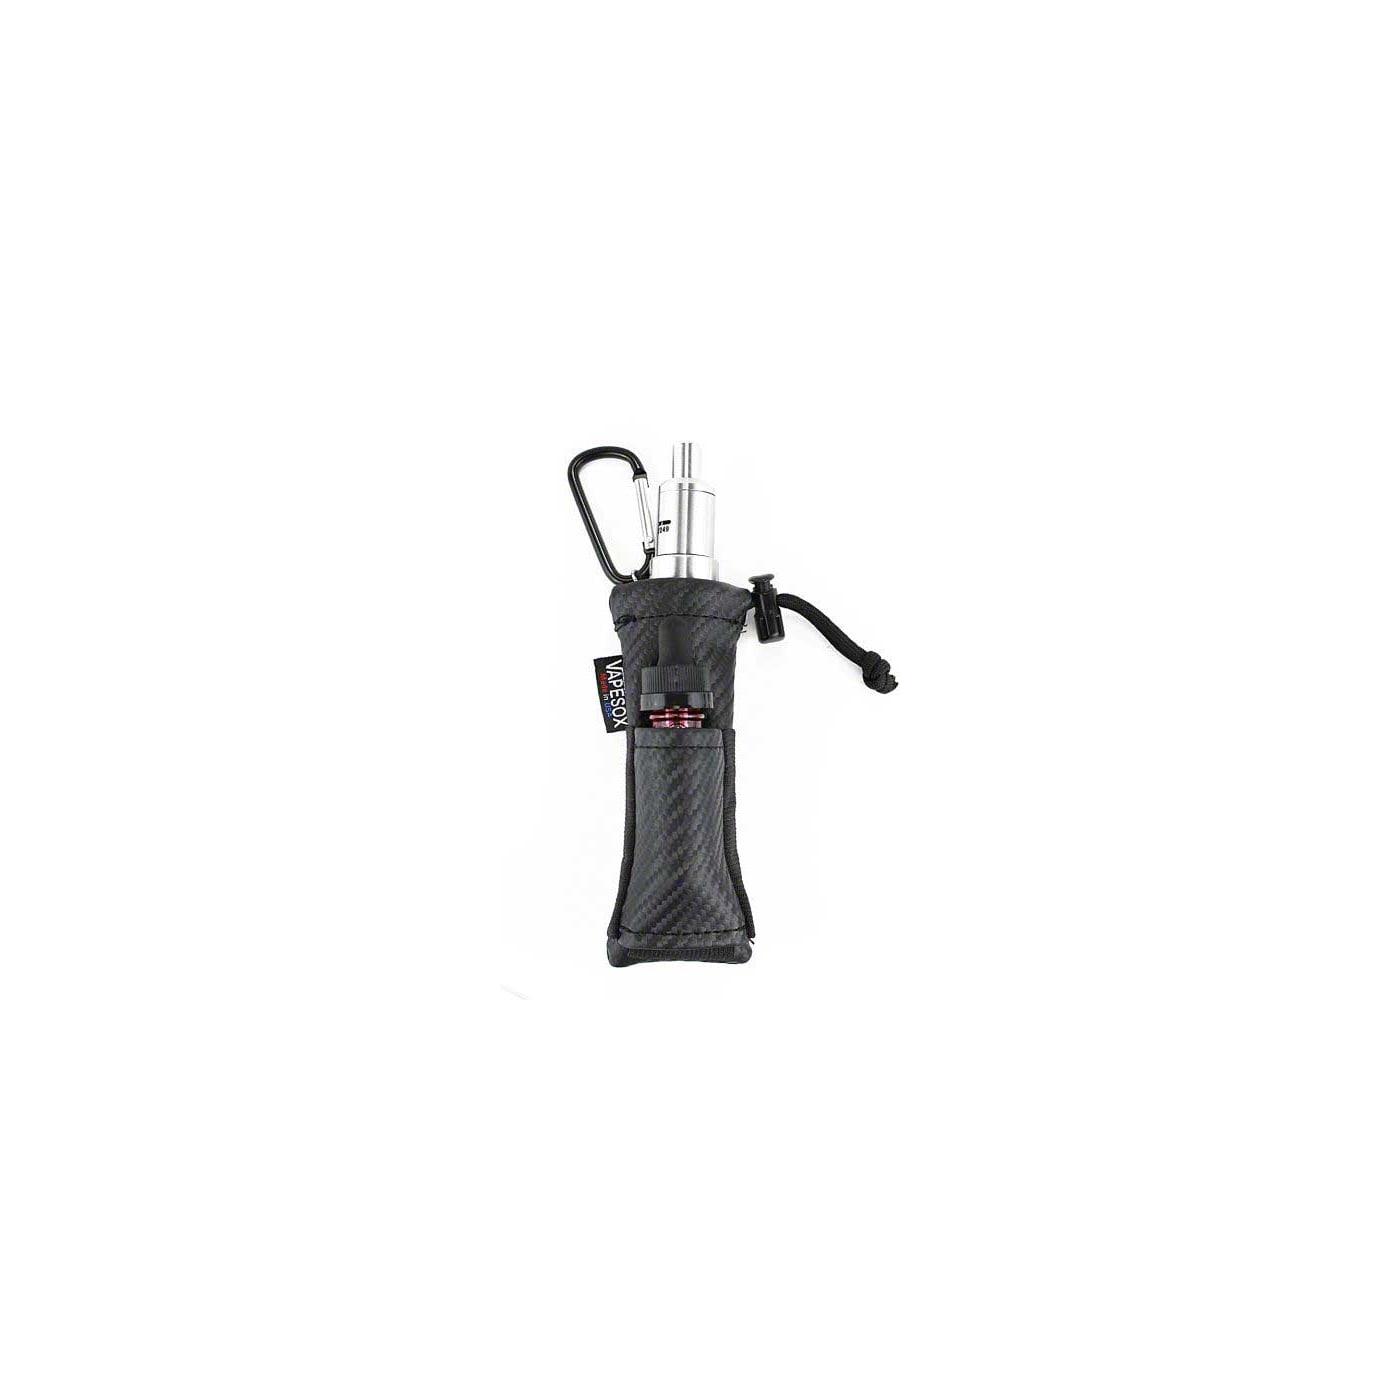 Vapesox VS5 Mod Holder - Black Carbon Fiber with items